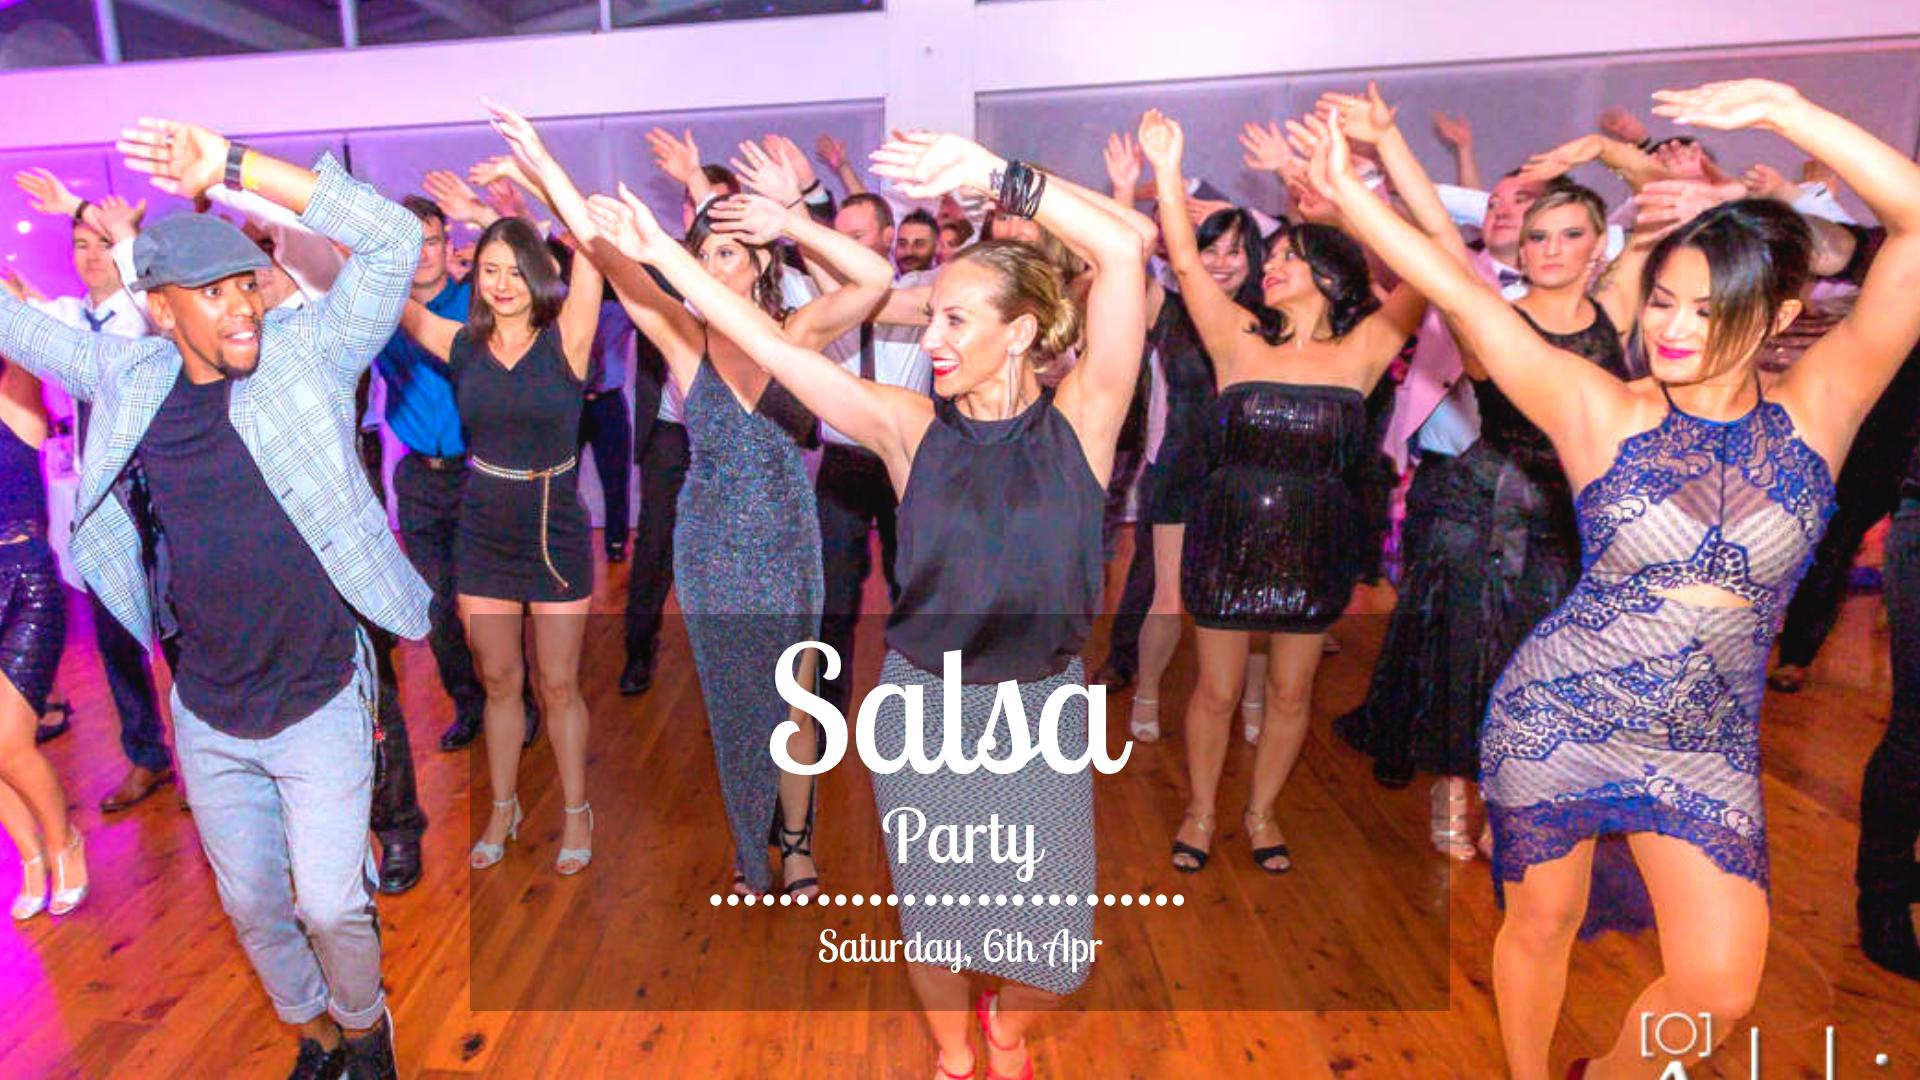 salsaparty.jpg